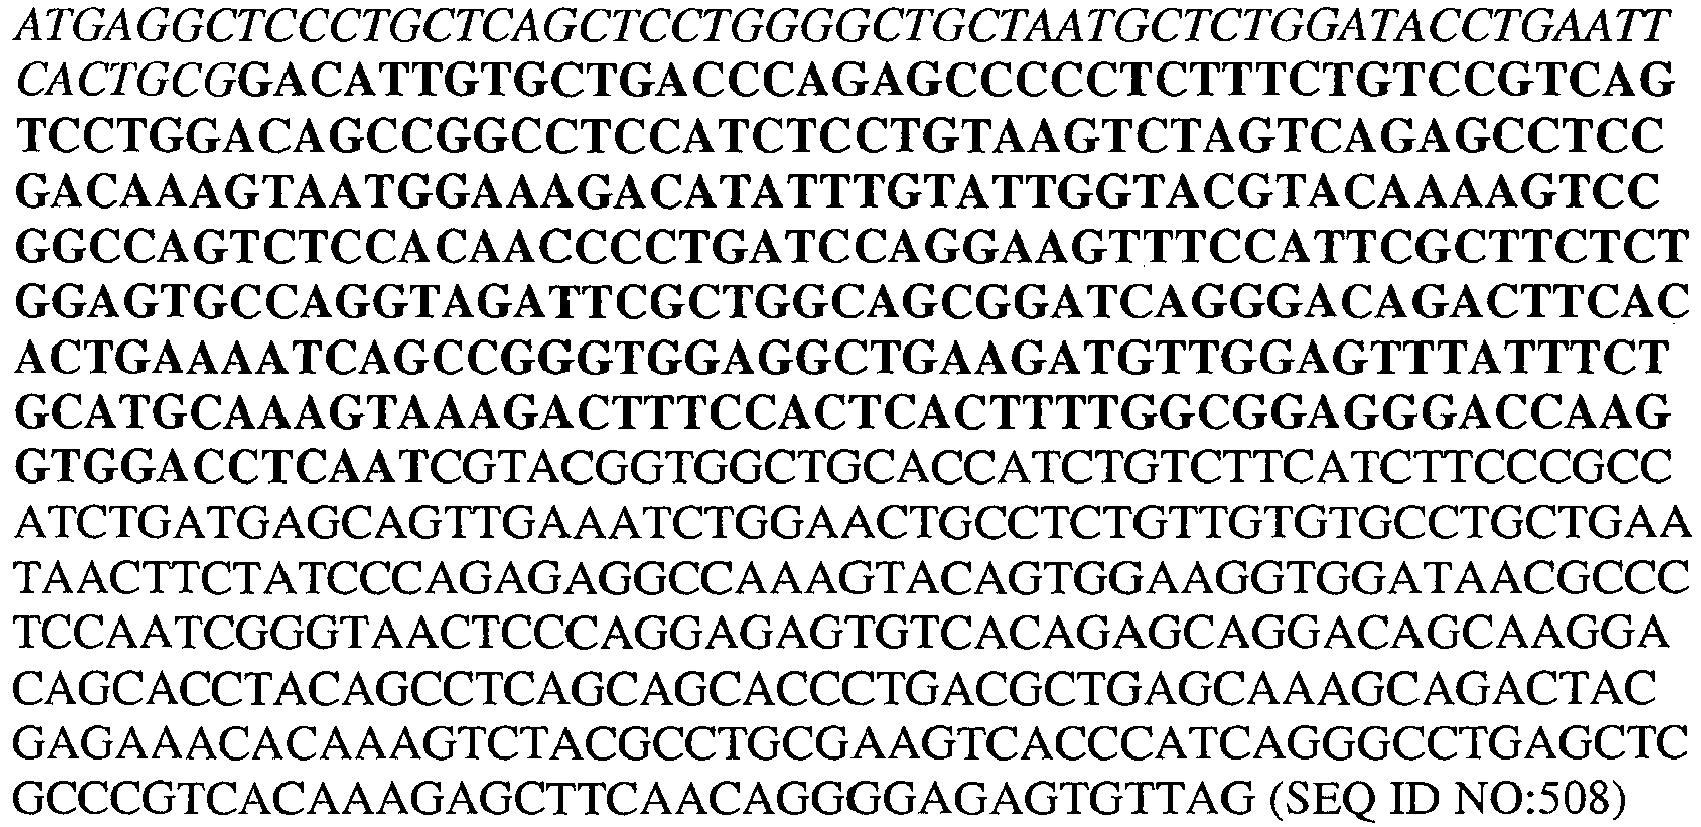 Figure imgb0378